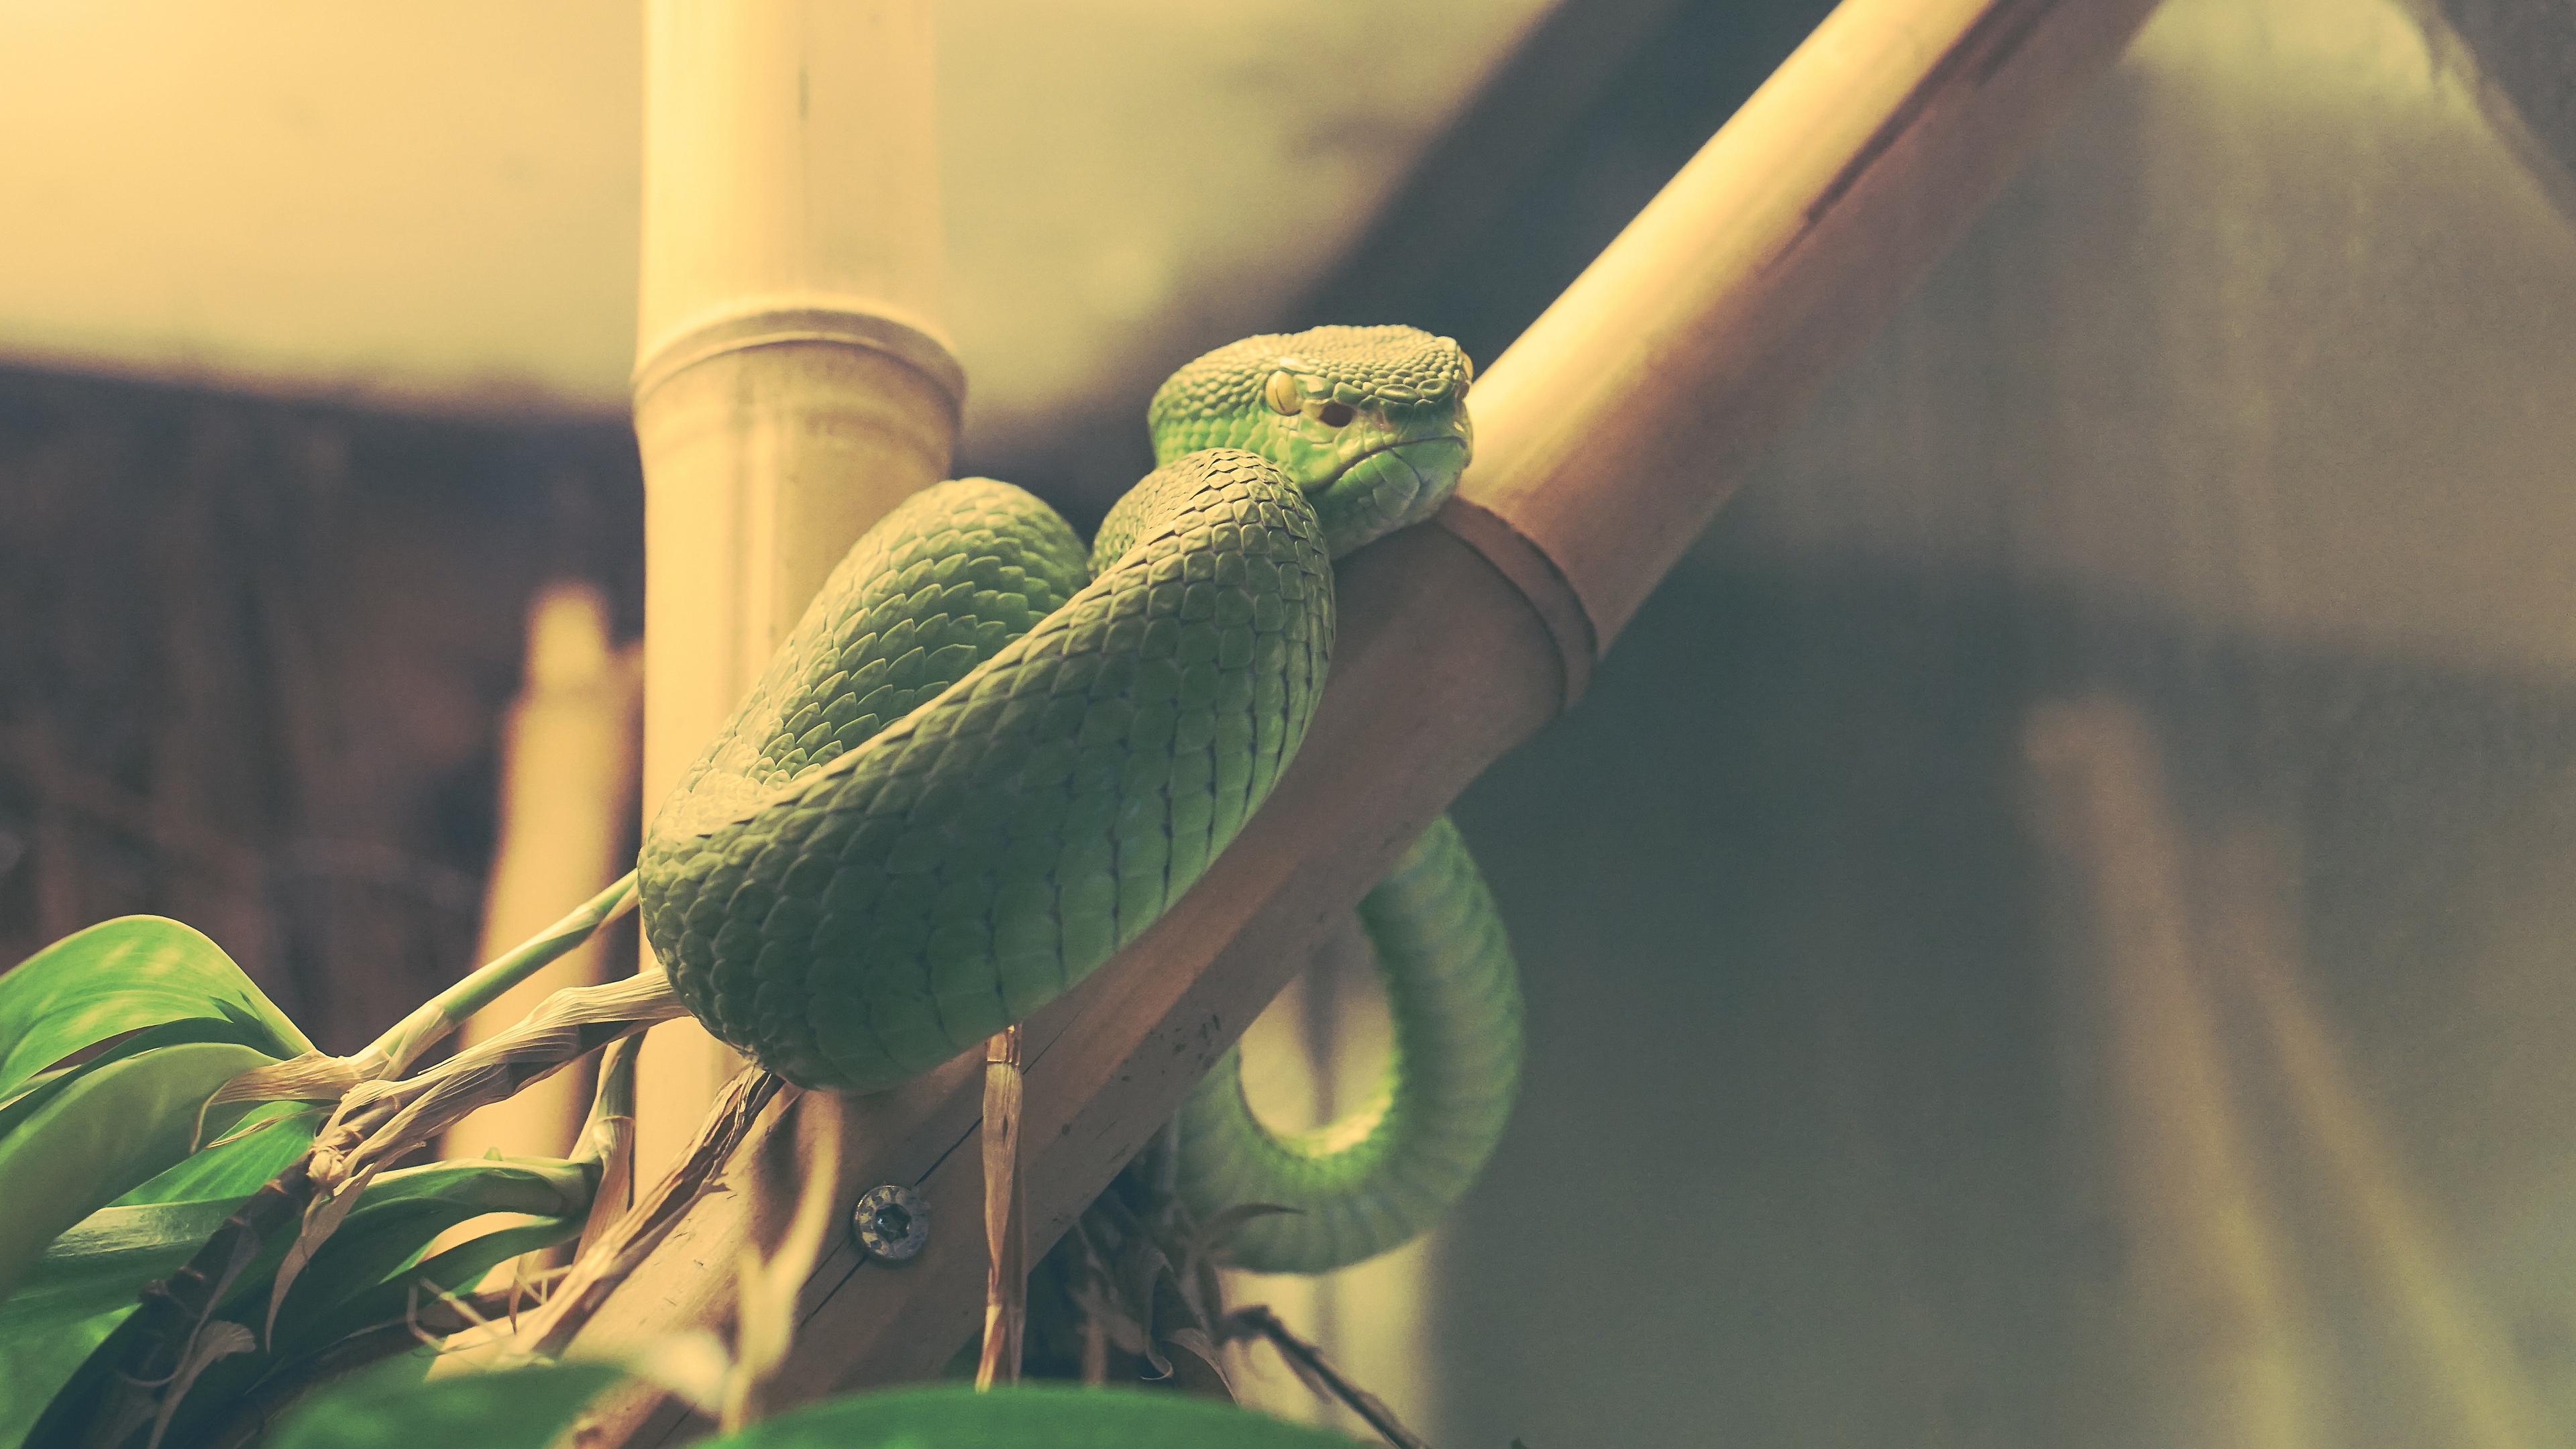 wood snake snake terrarium reptile 4k 1542241455 - wood snake, snake, terrarium, reptile 4k - wood snake, terrarium, Snake